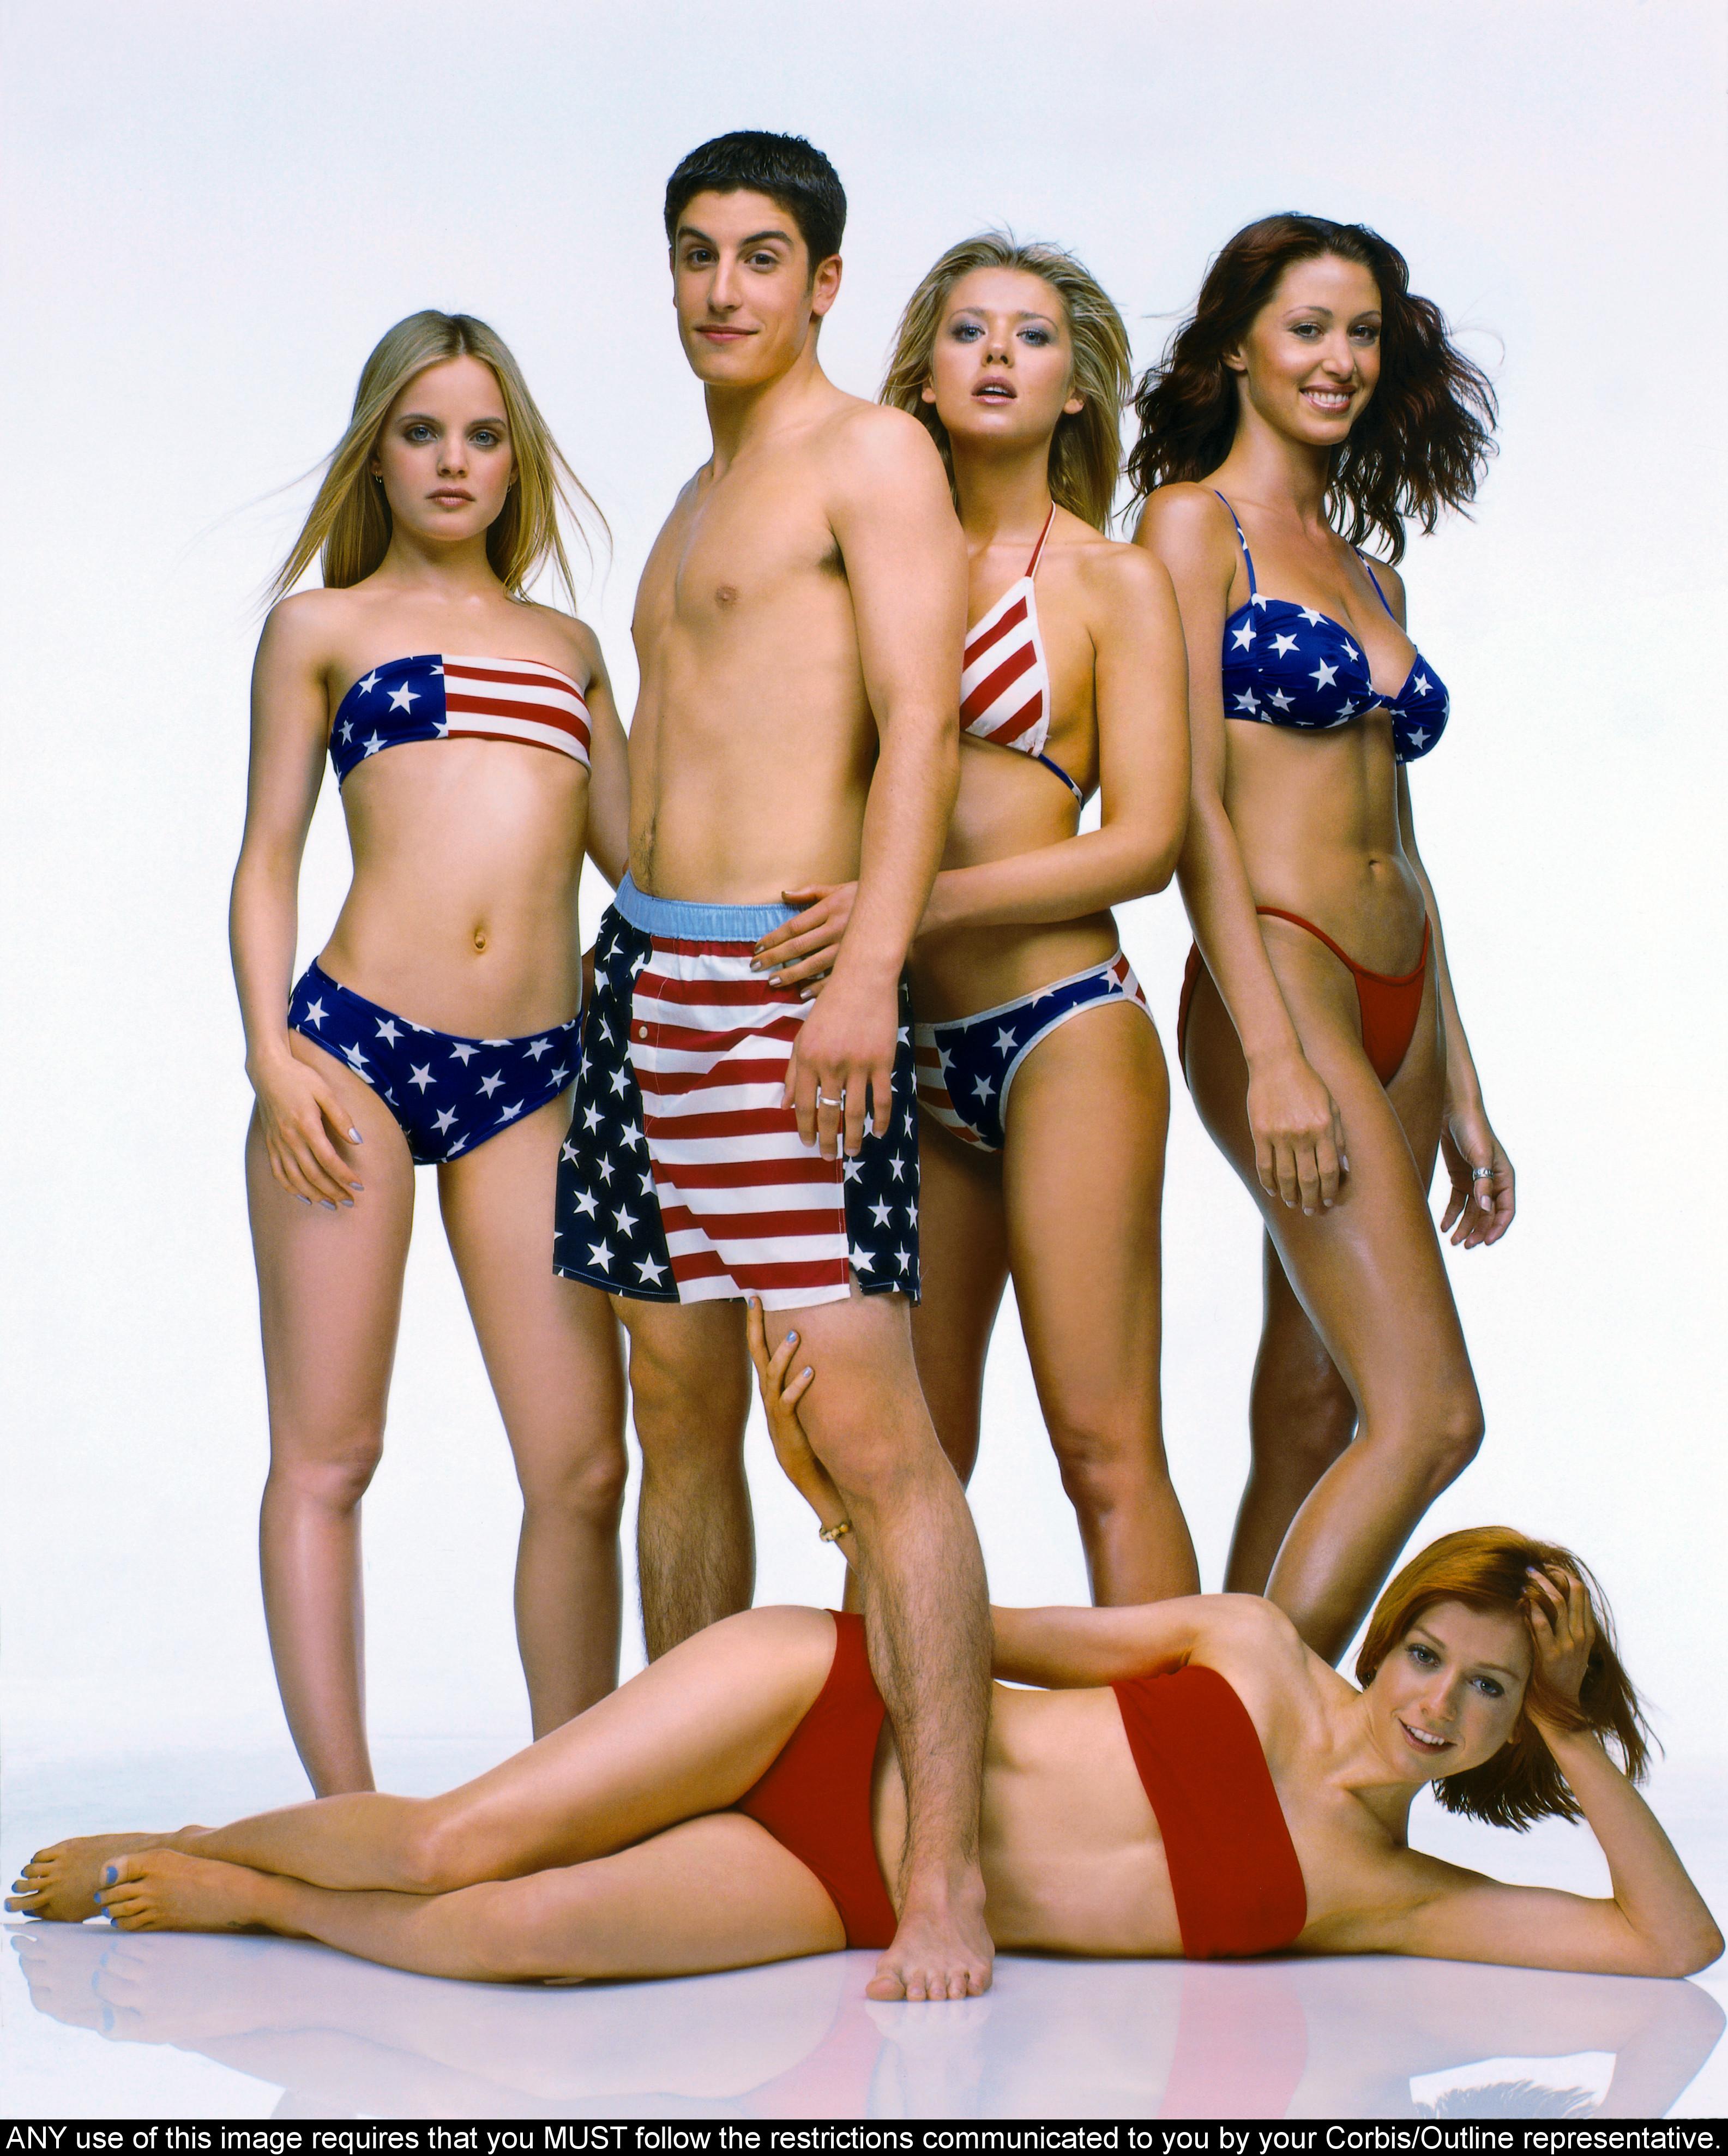 golie-amerikanki-kartinki